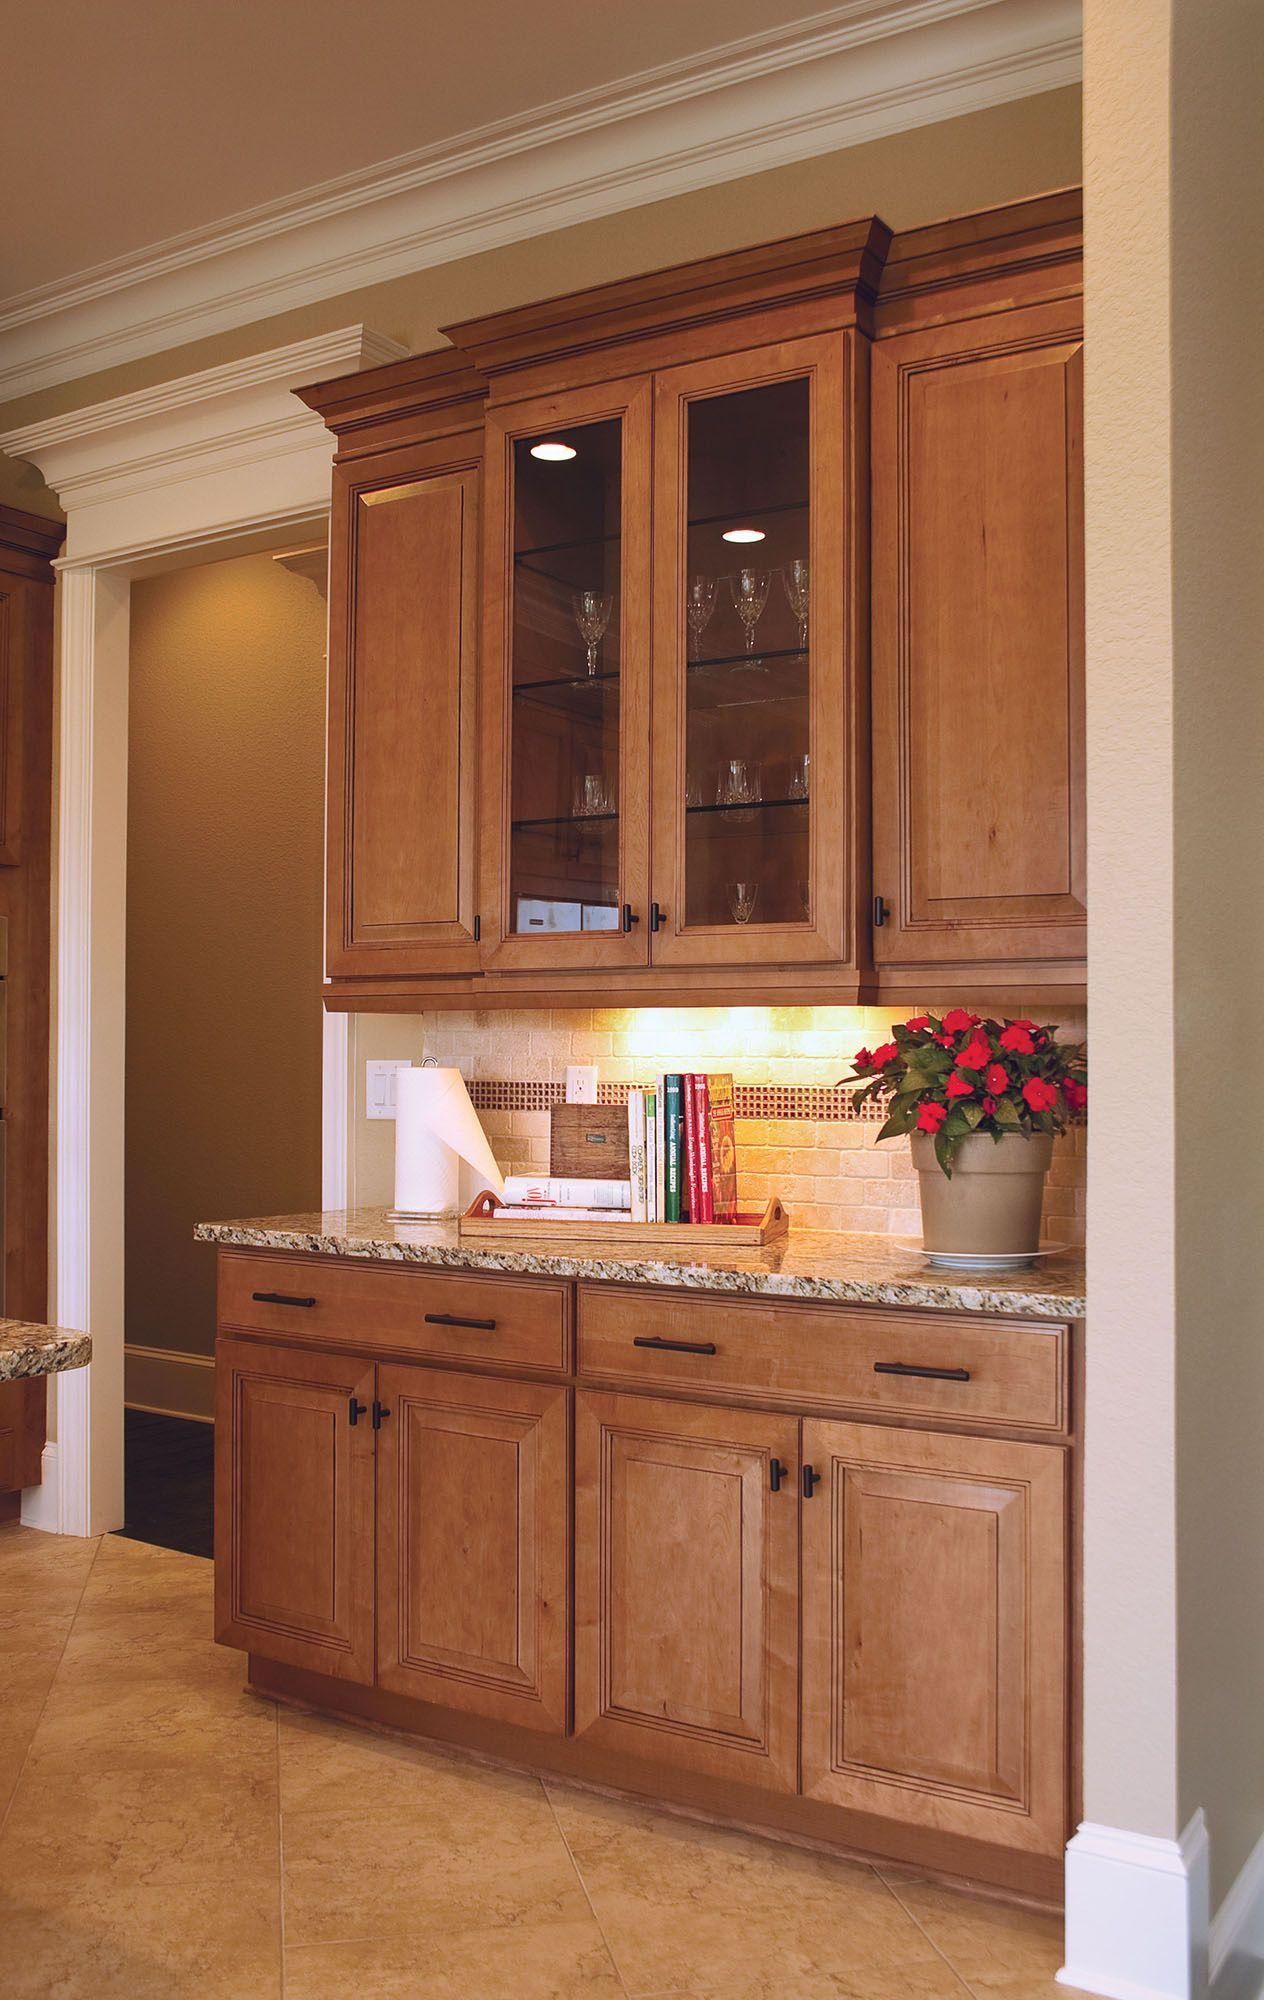 Molding Kitchen Cabinet Doors 2021 Glass Kitchen Cabinets Kitchen Cabinet Doors Luxury Kitchen Cabinets